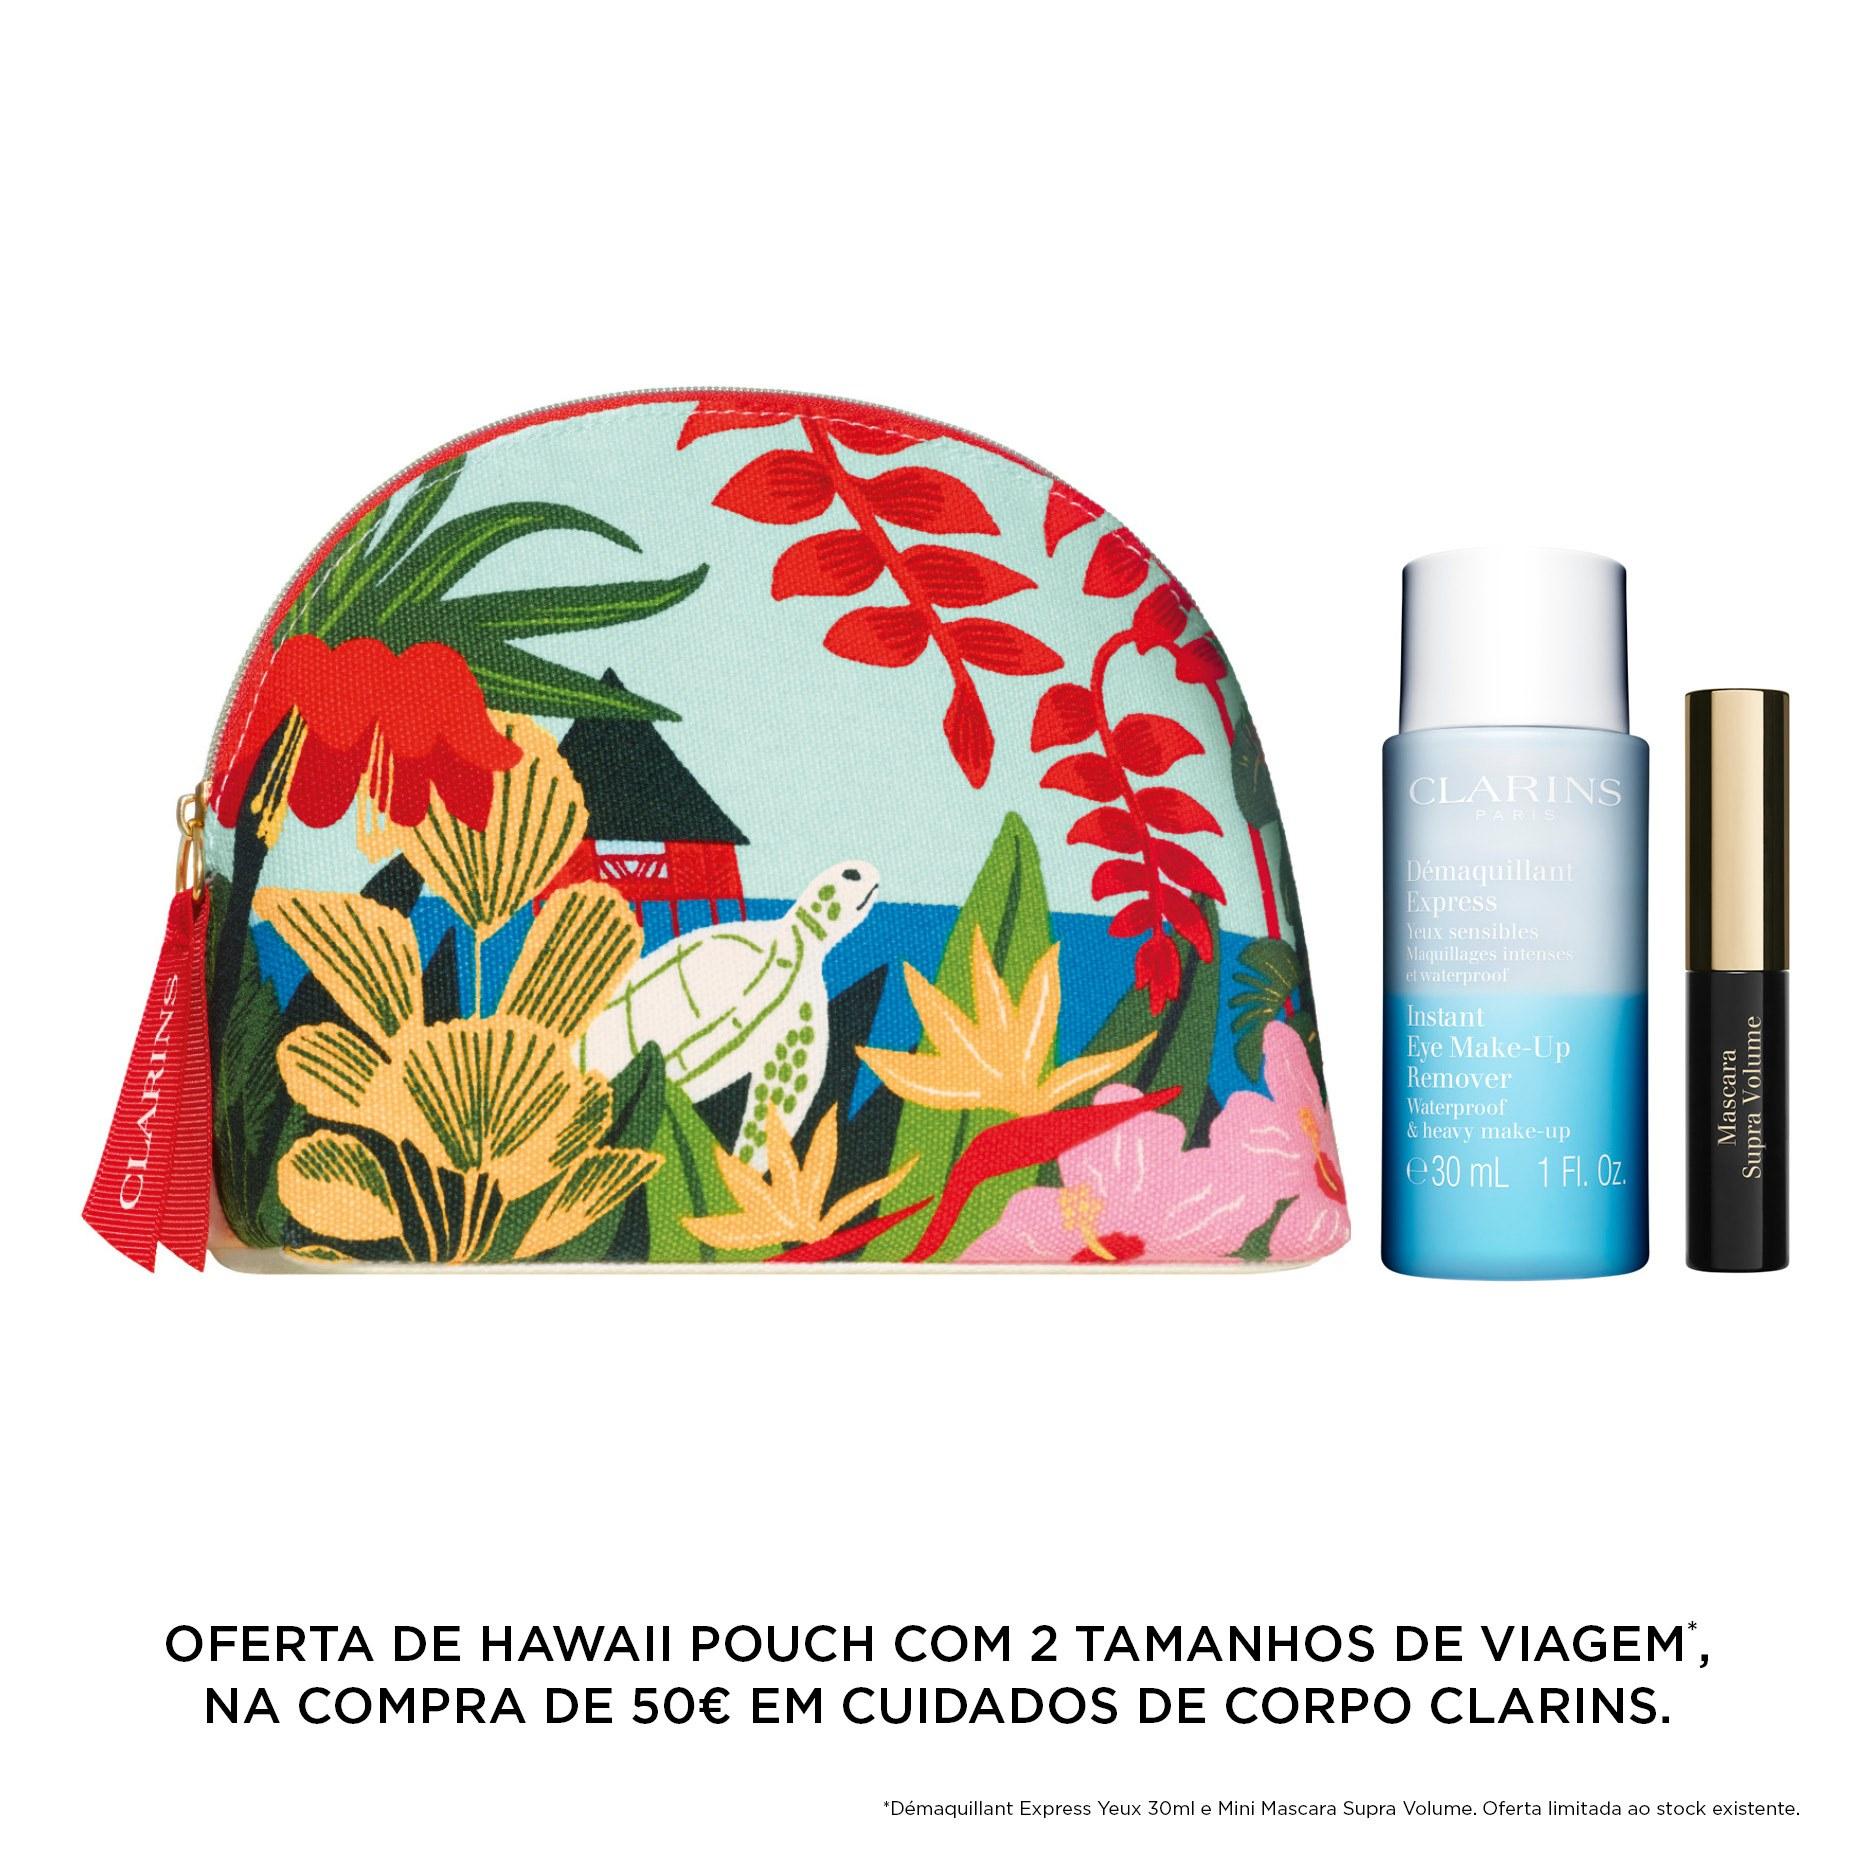 Oferta Clarins Hawaii pouch na compra de 50€ em cuidados de corpo da marca.